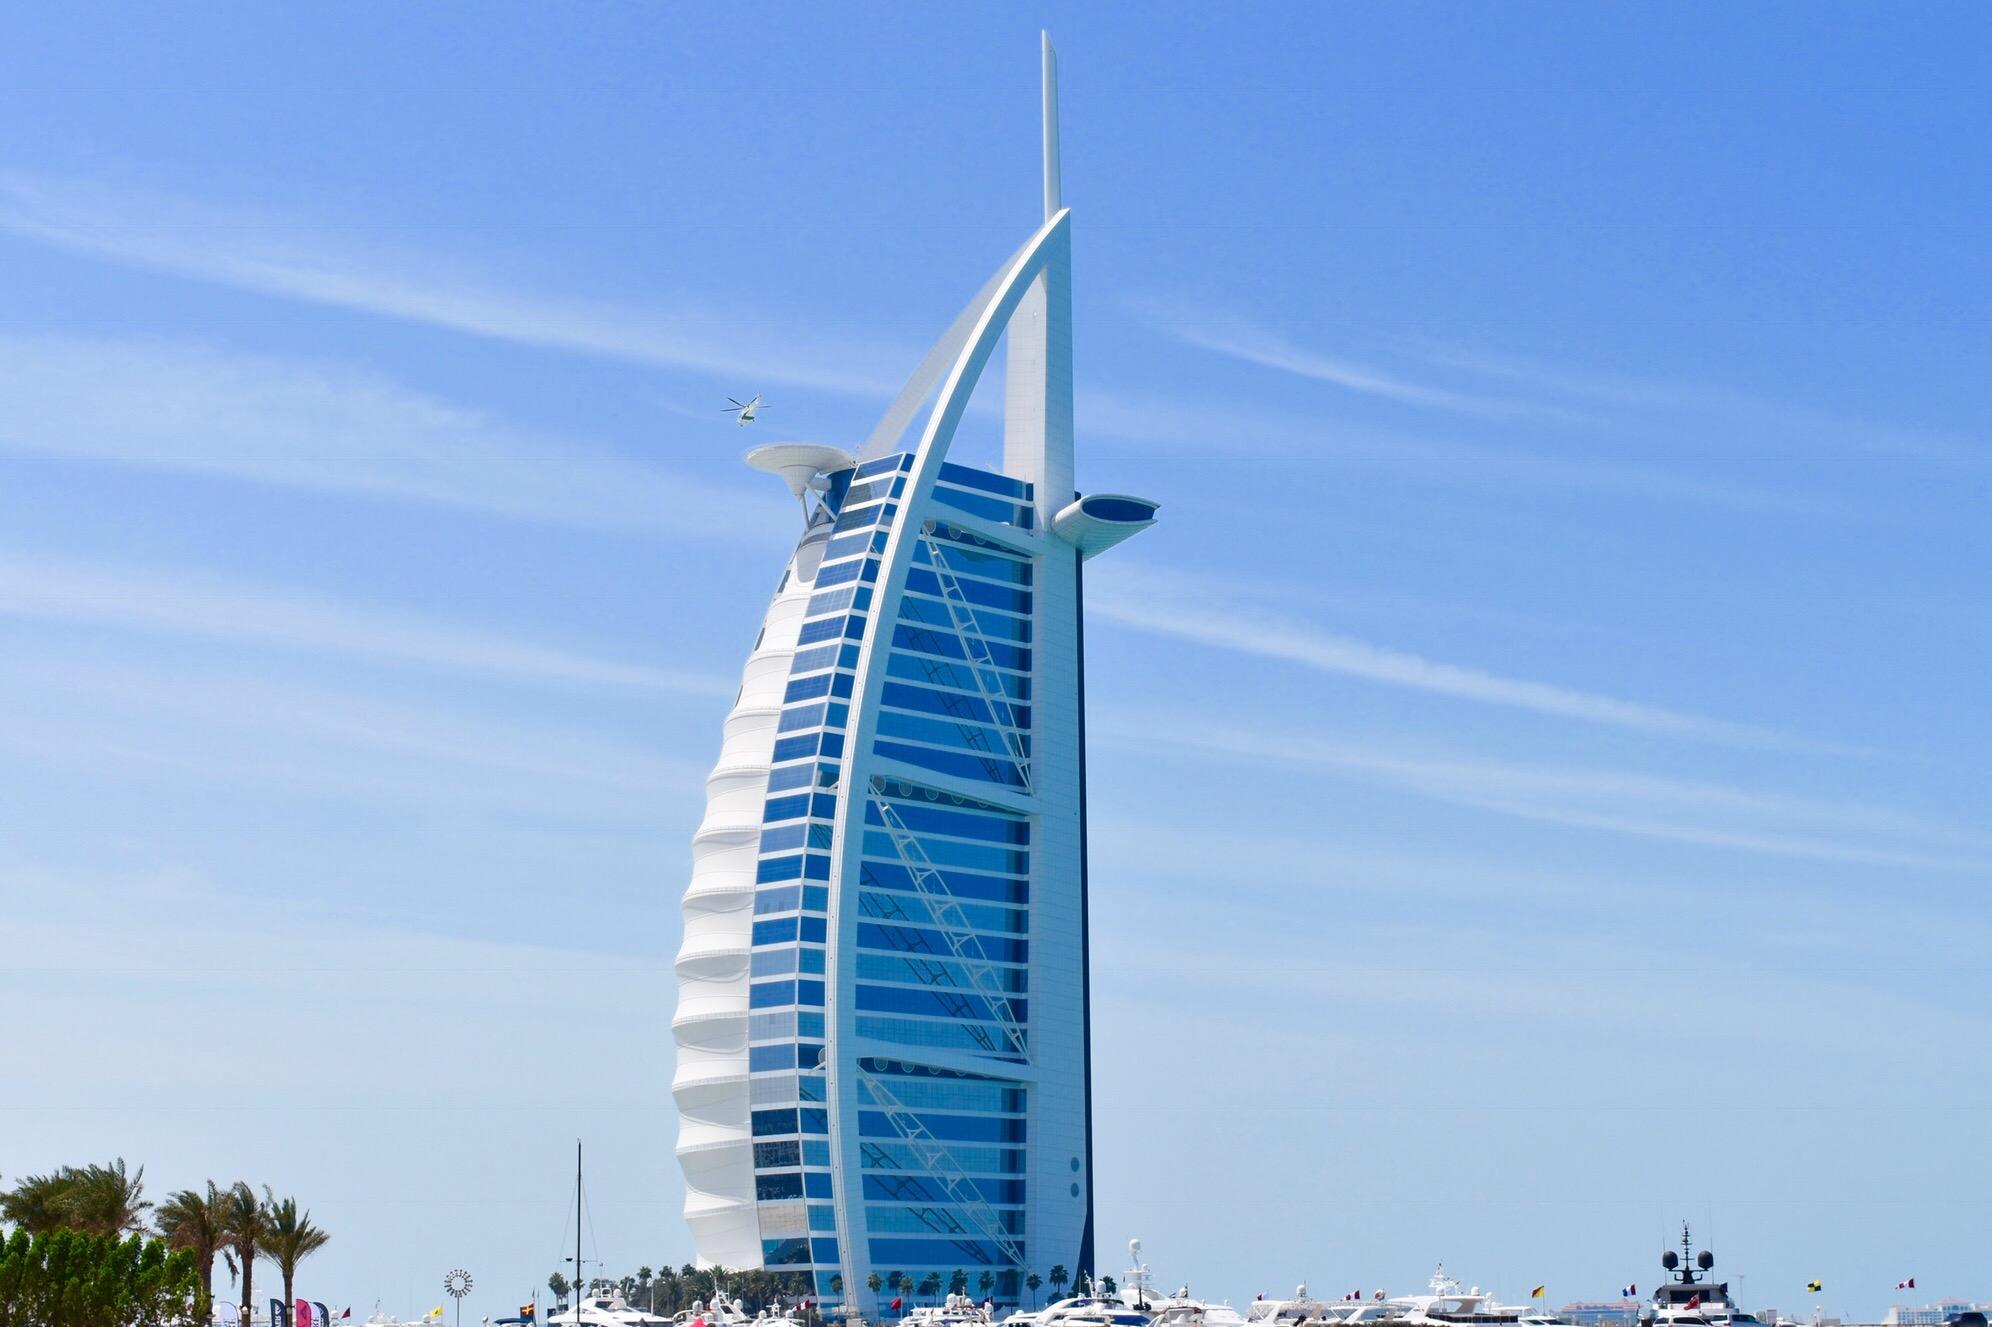 Burj al arab 7 experience daniel marin for Burj al arab reservation